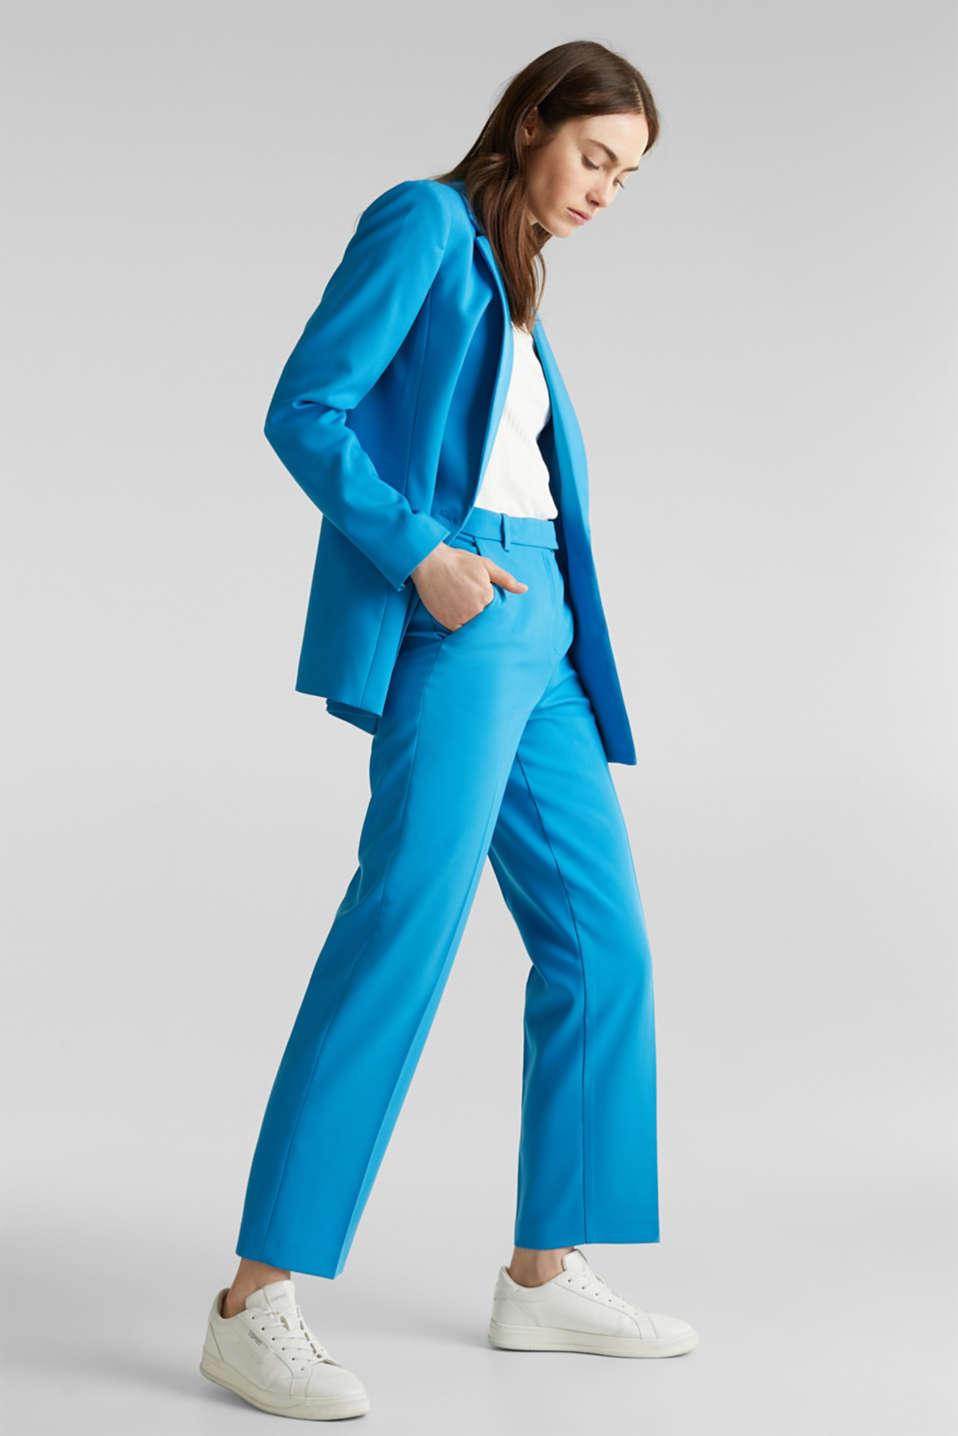 SHIMMER mix + match stretch blazer, DARK TURQUOISE, detail image number 1